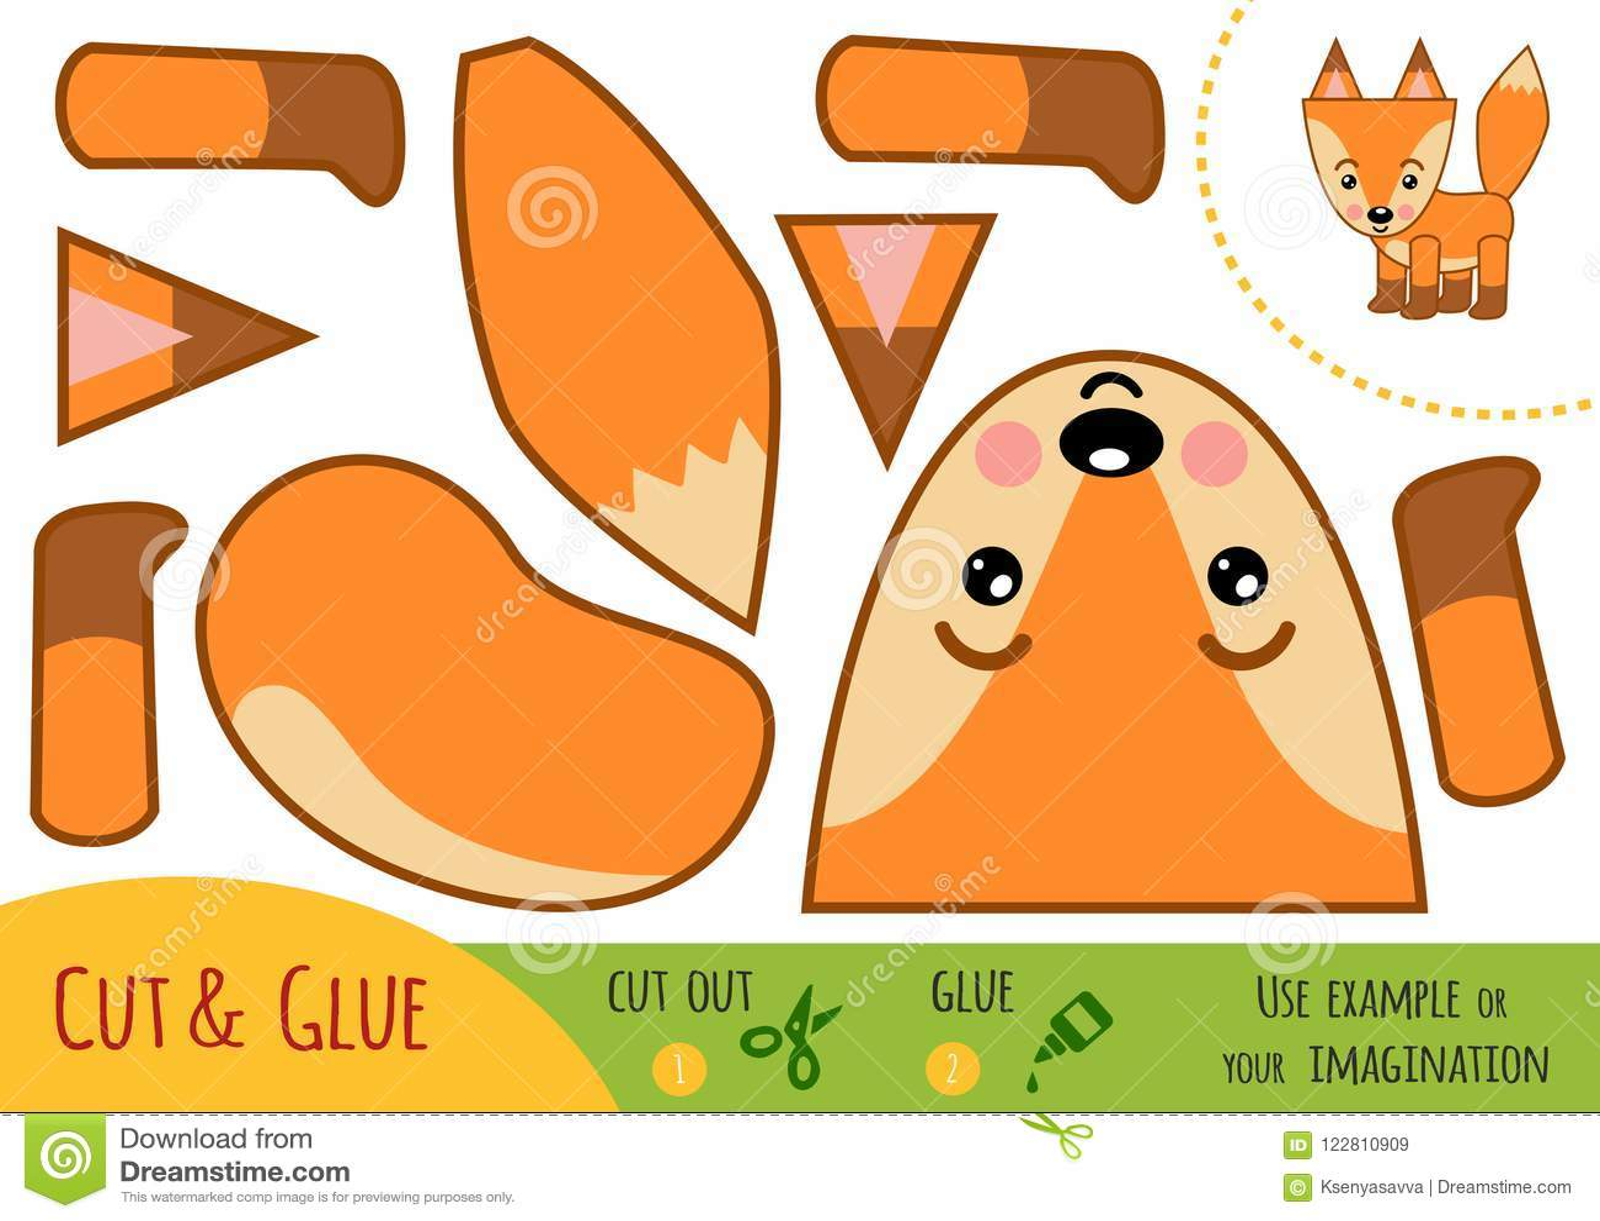 Education paper game for children, Fox